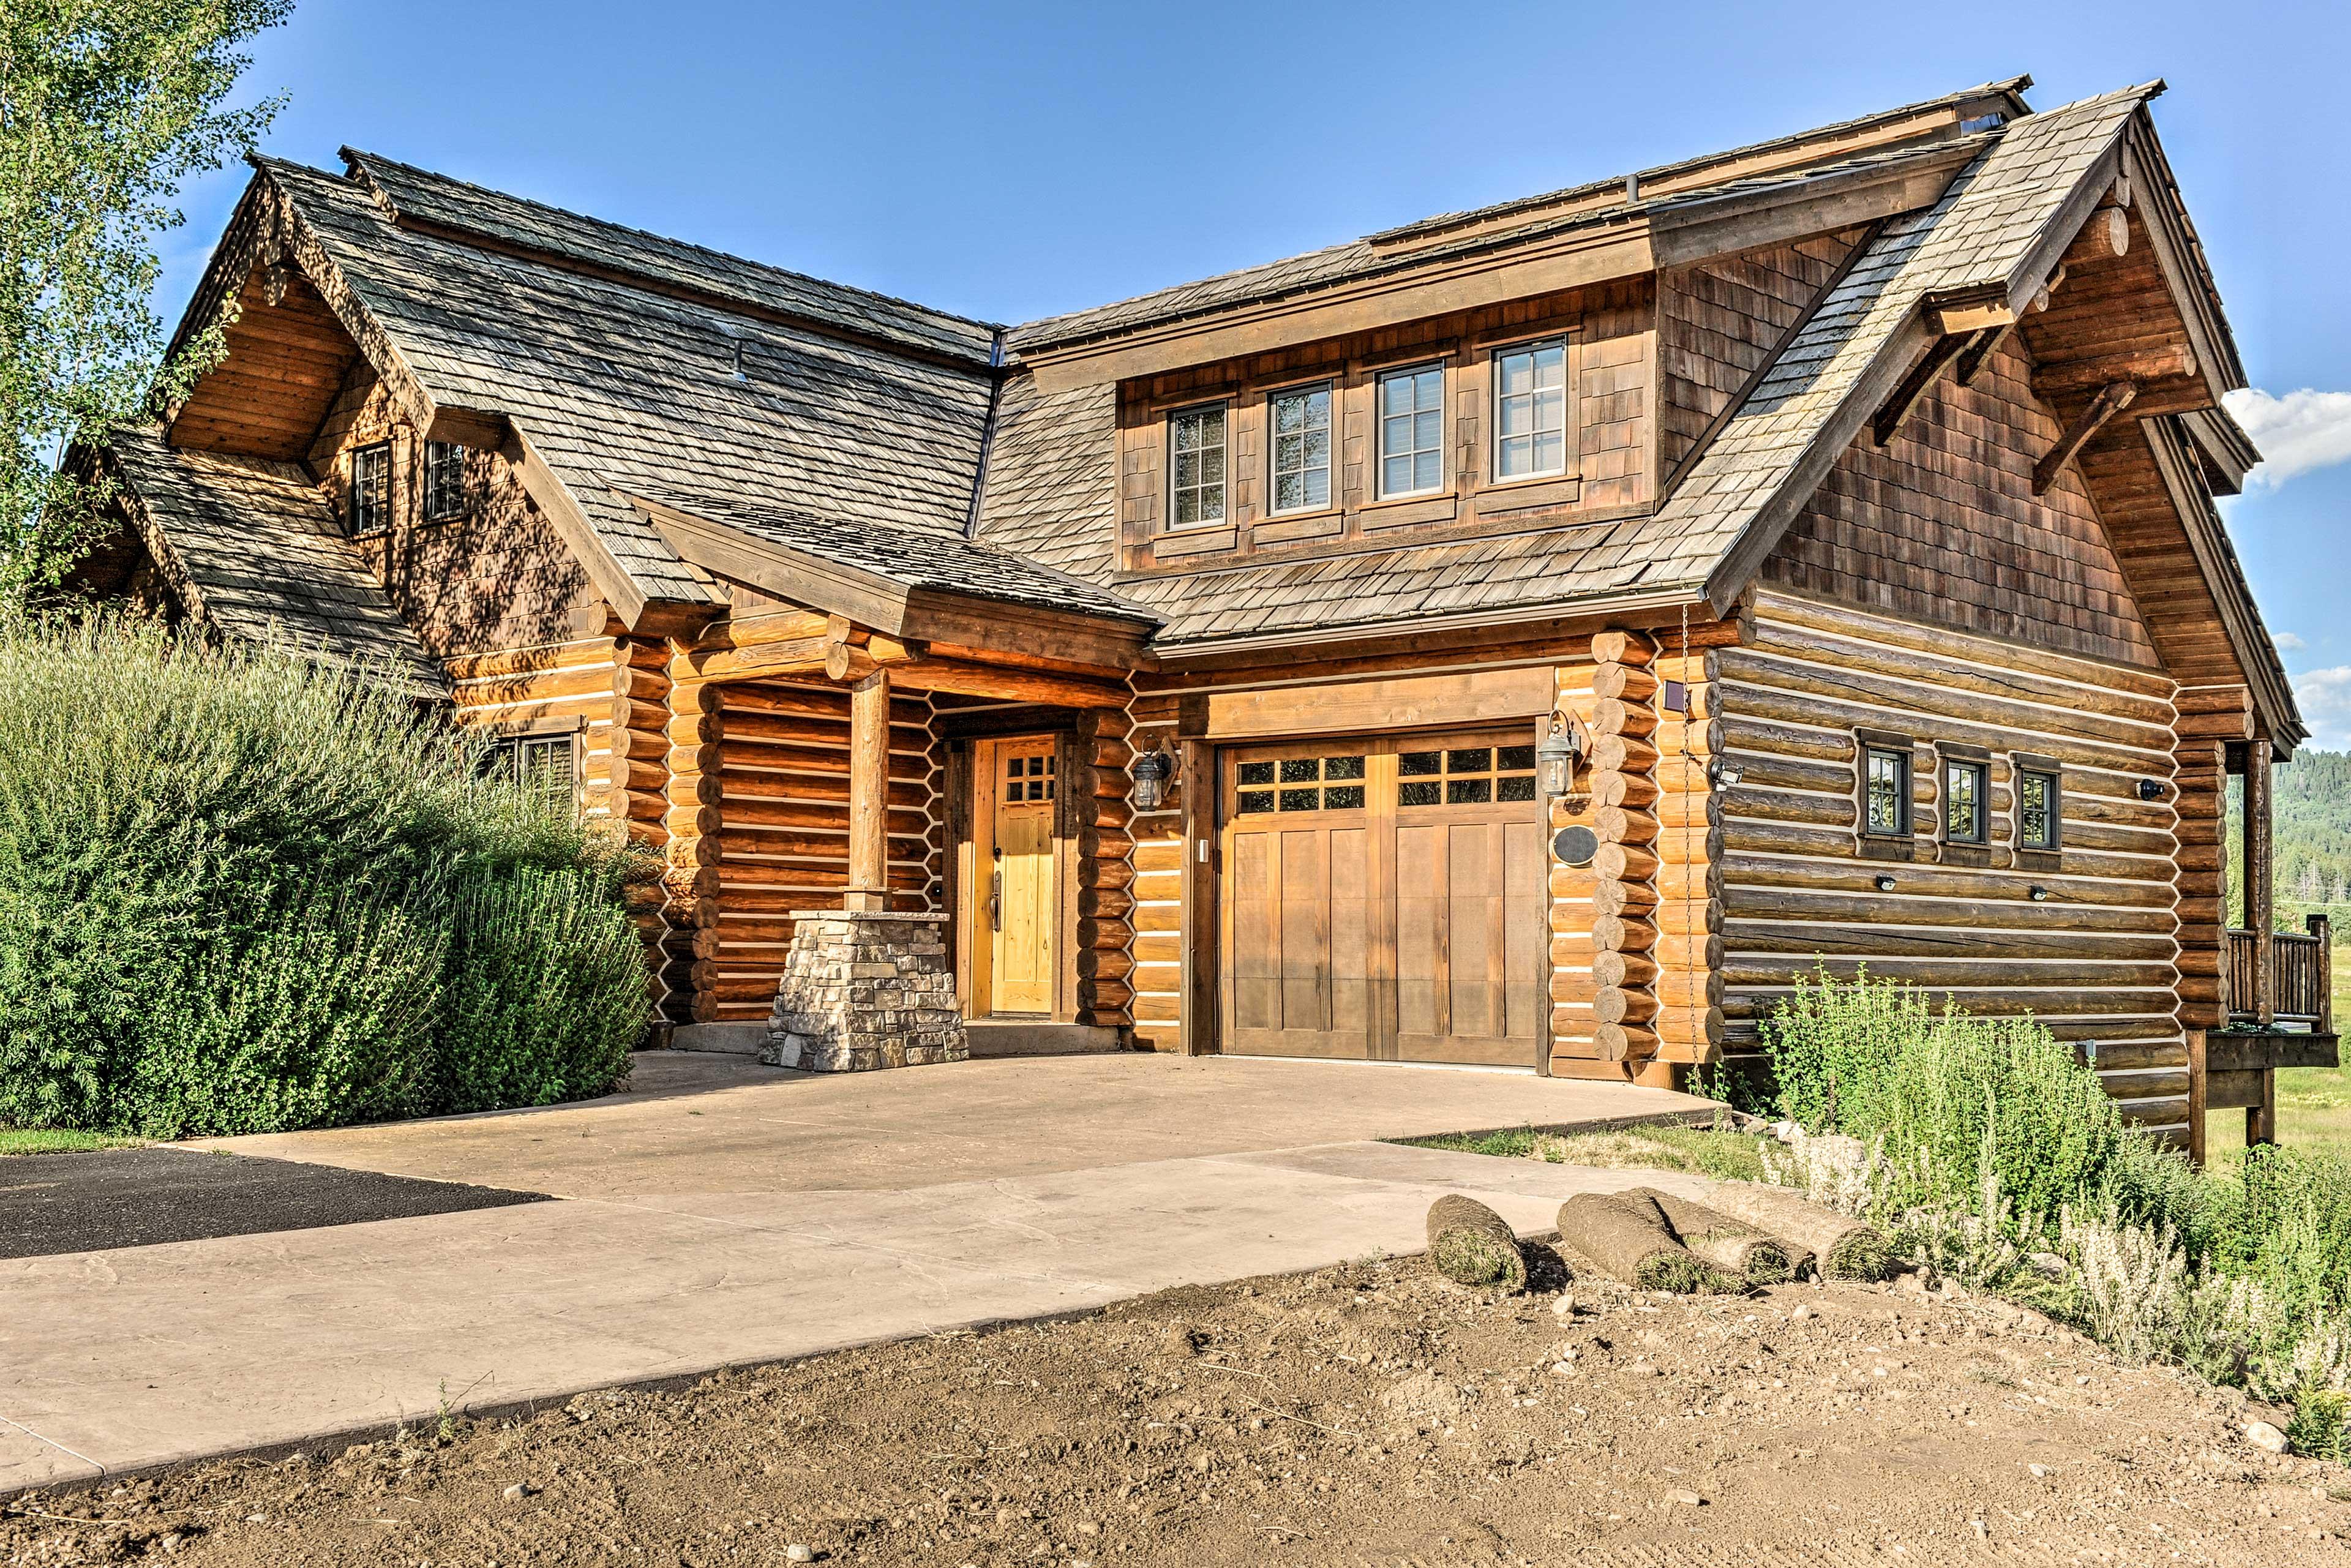 Teton Springs Cabin photo